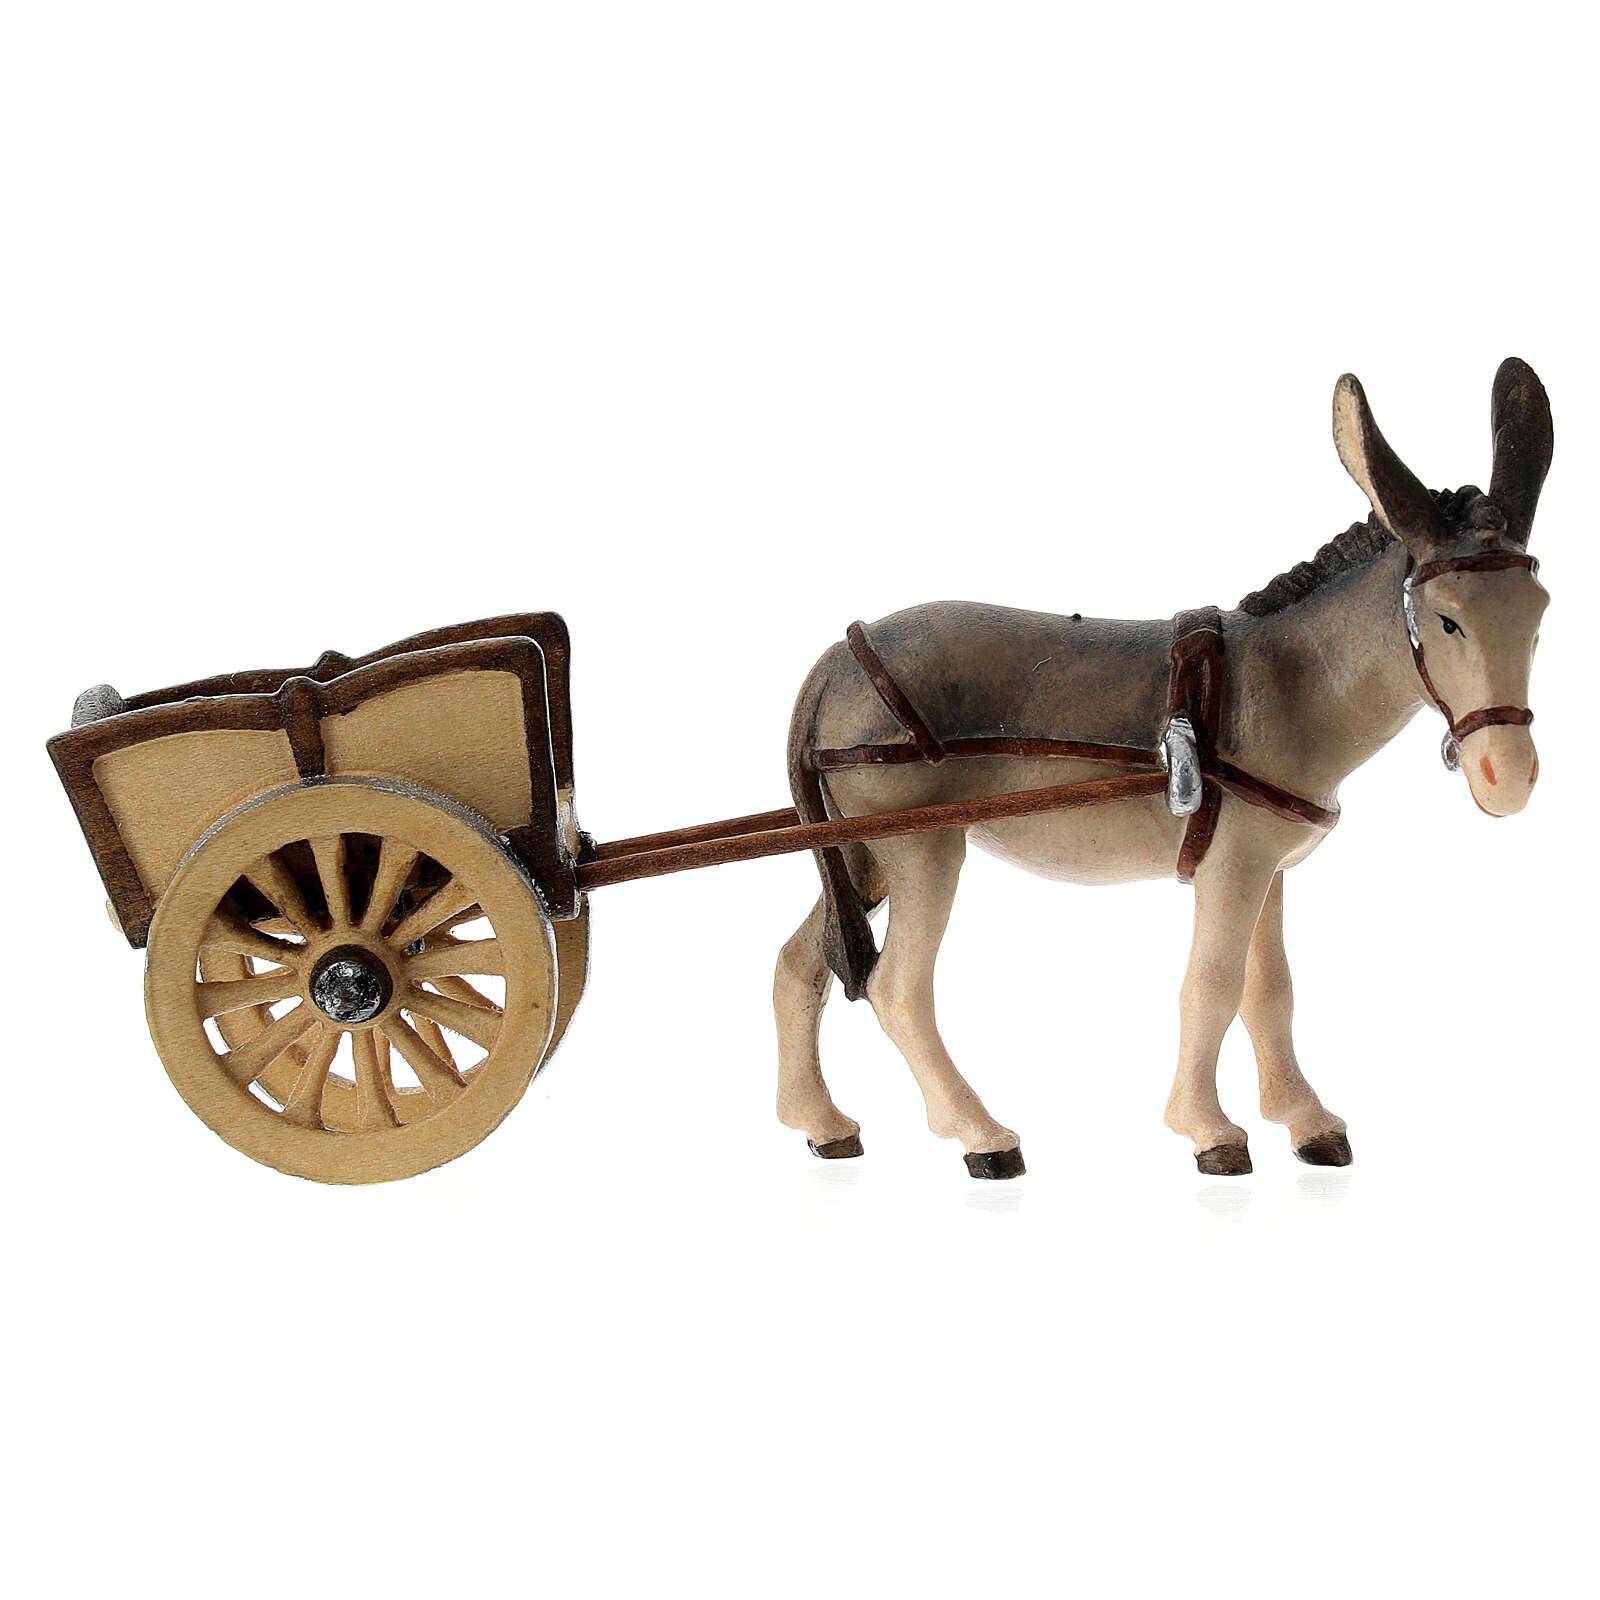 Âne avec charrette santon bois peint crèche Kostner 9,5 cm